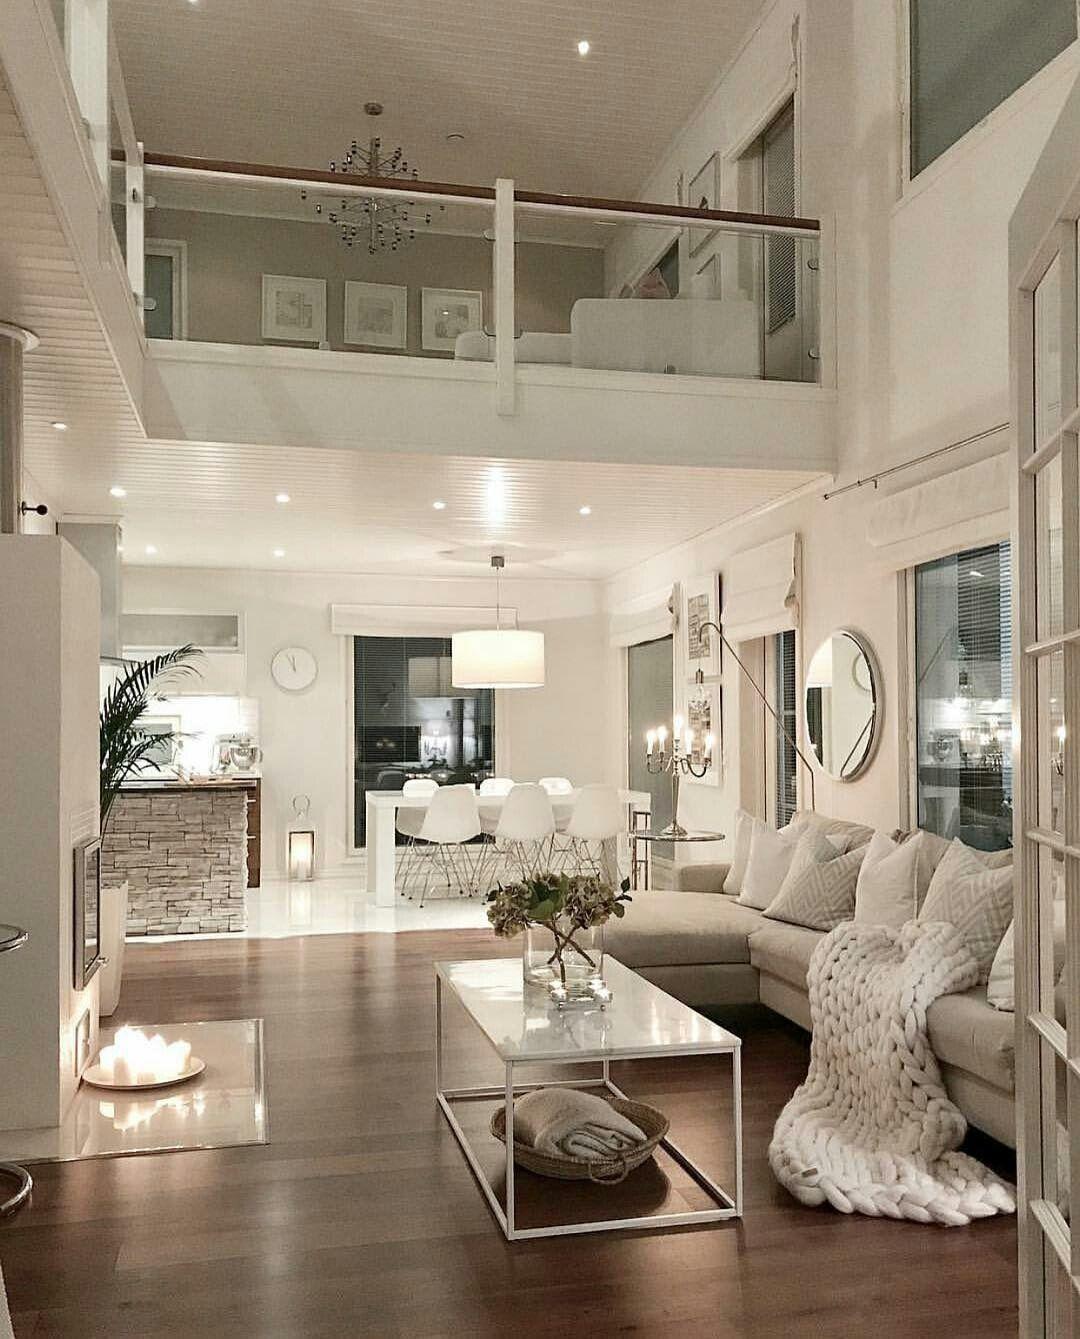 Duplex Inspiration Pkliving My Living Interior Design Is The